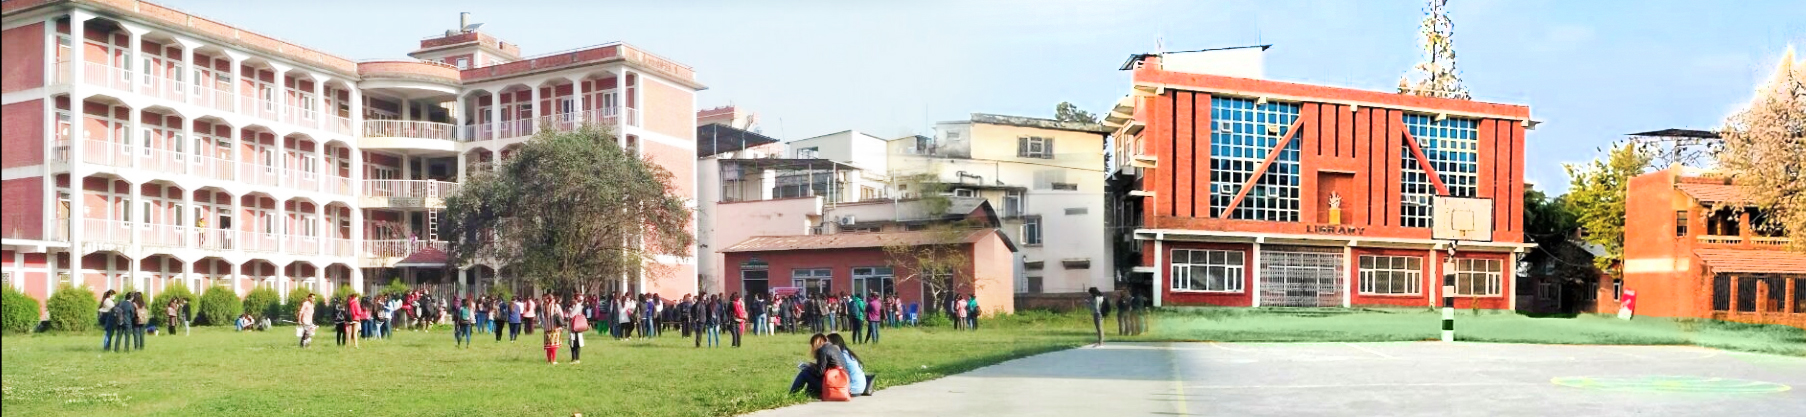 Padmakanya Campus